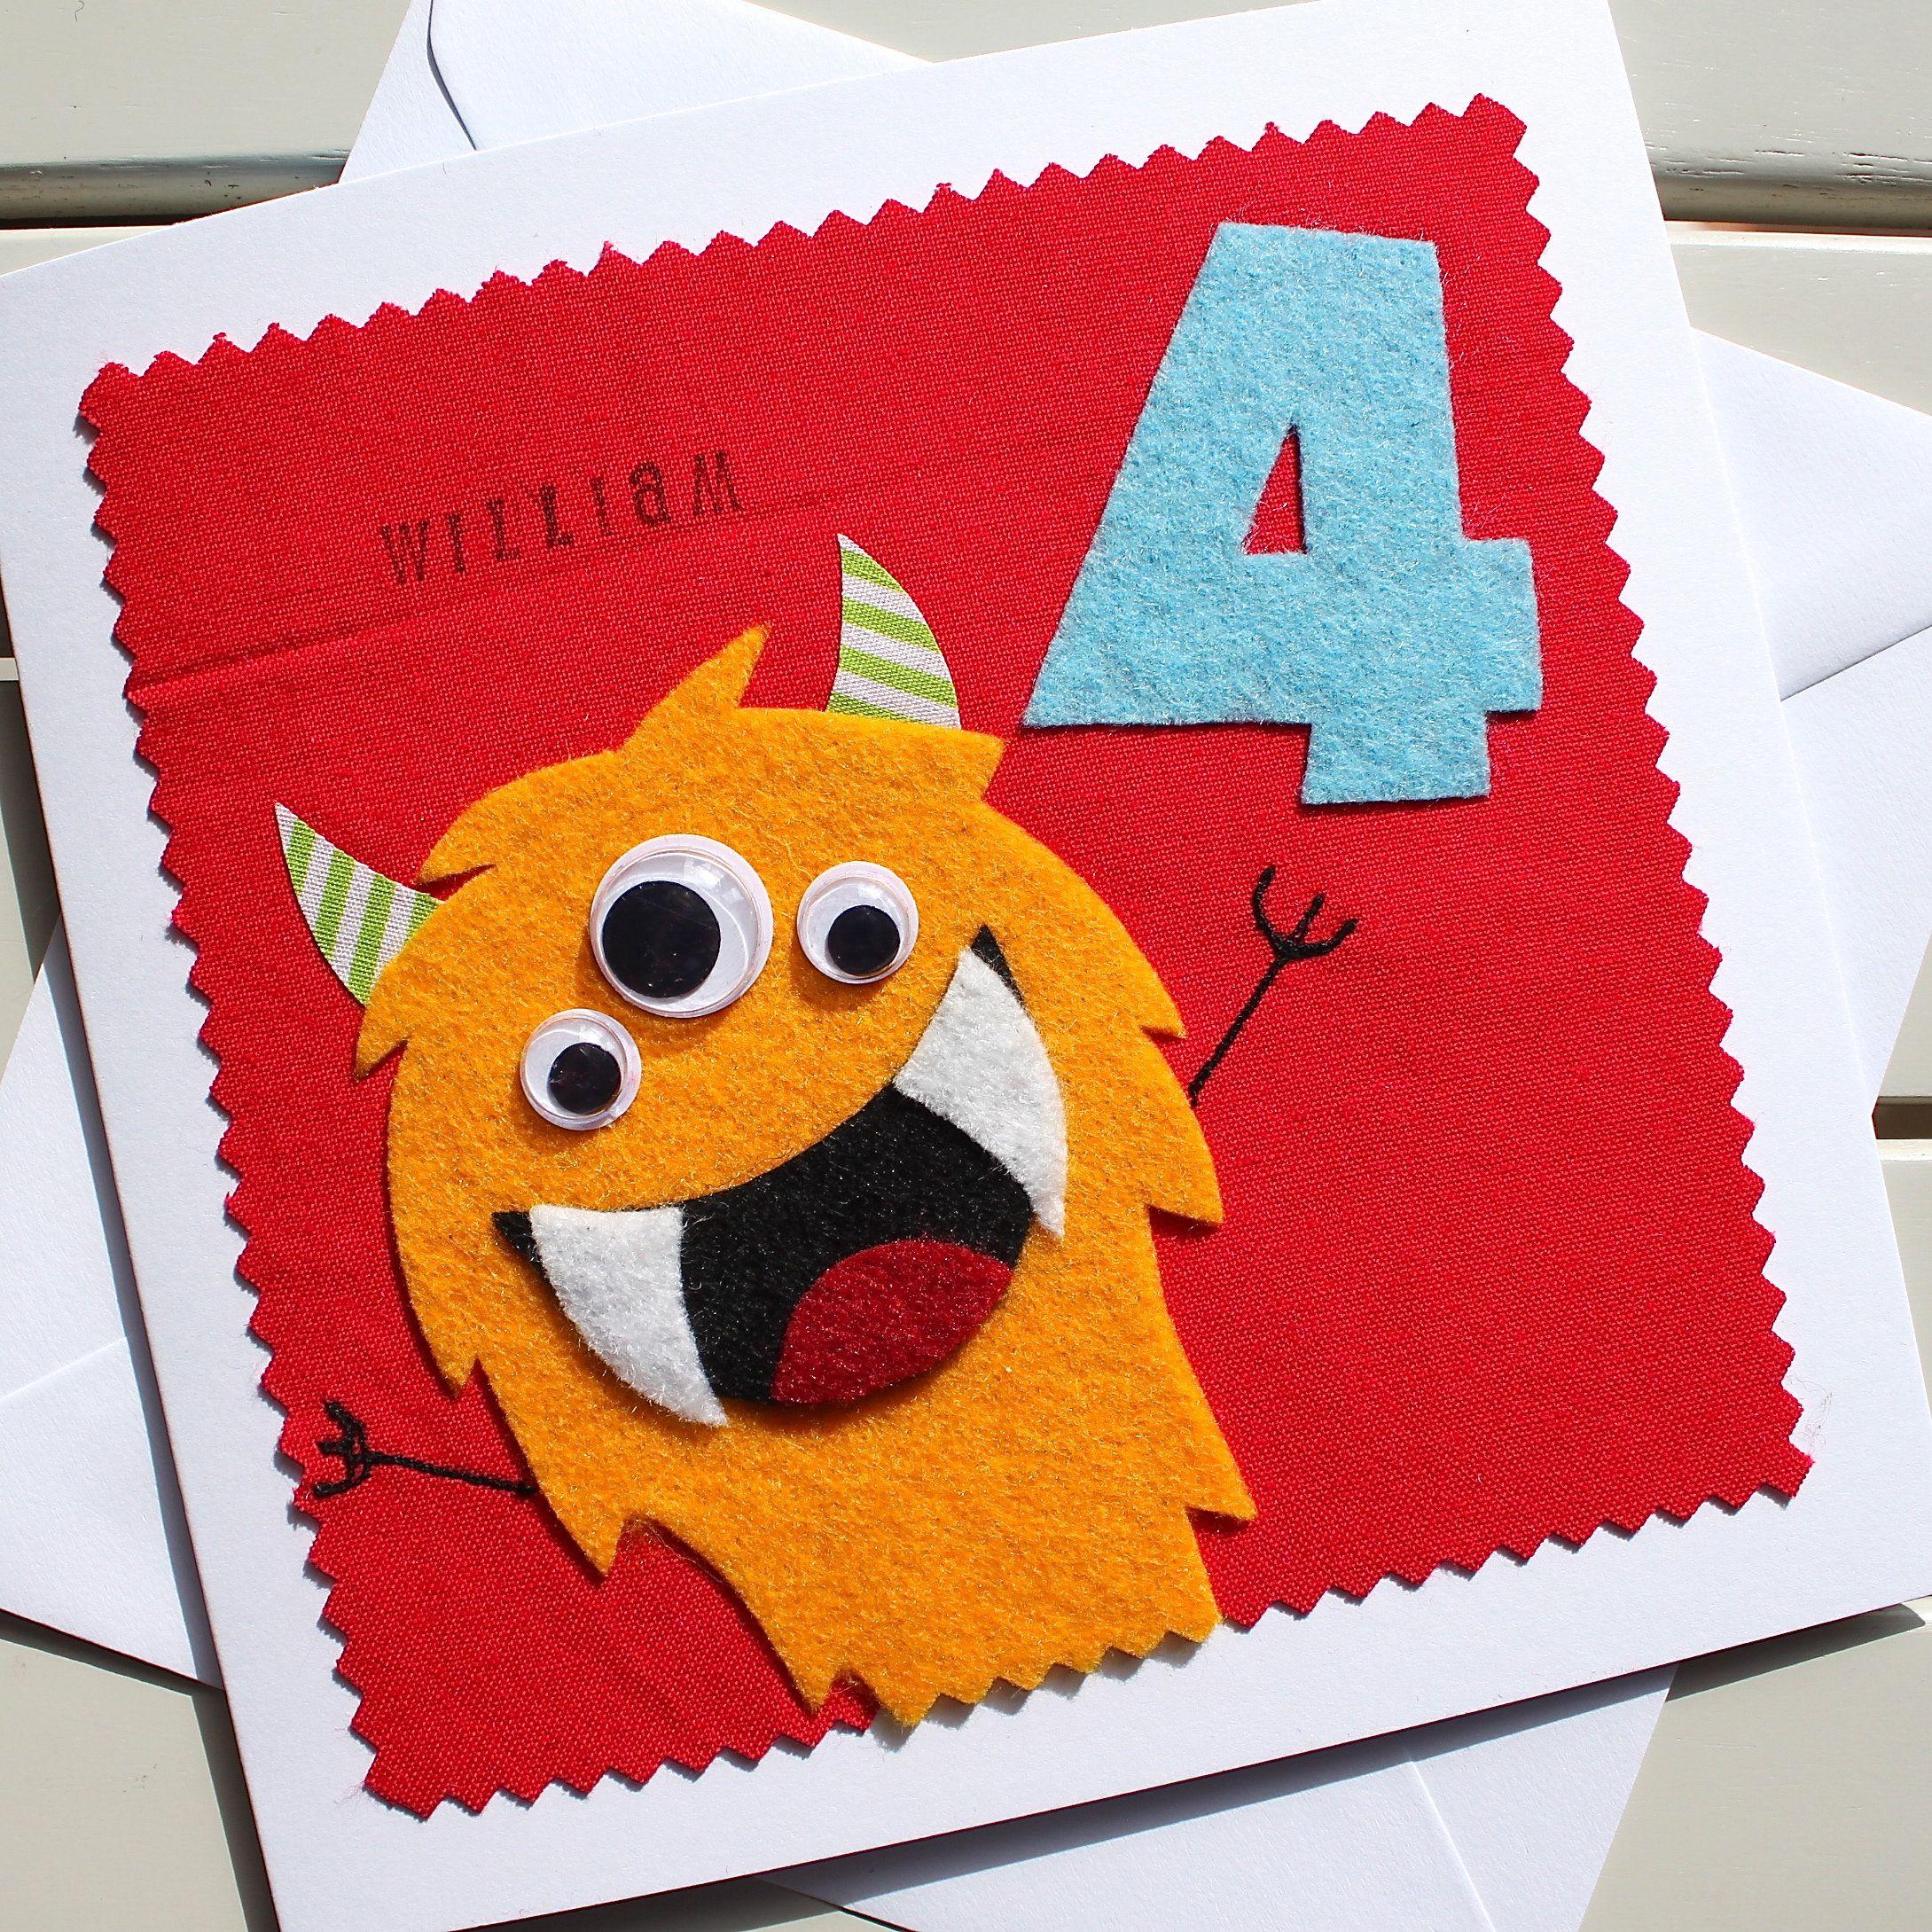 Monster Personalised Children S Birthday Card Handmade Felt And Fabric Card Boys Birthday Card Sons Birthday Card Grandsons Card Handmade Birthday Cards Birthday Cards For Boys Fabric Cards